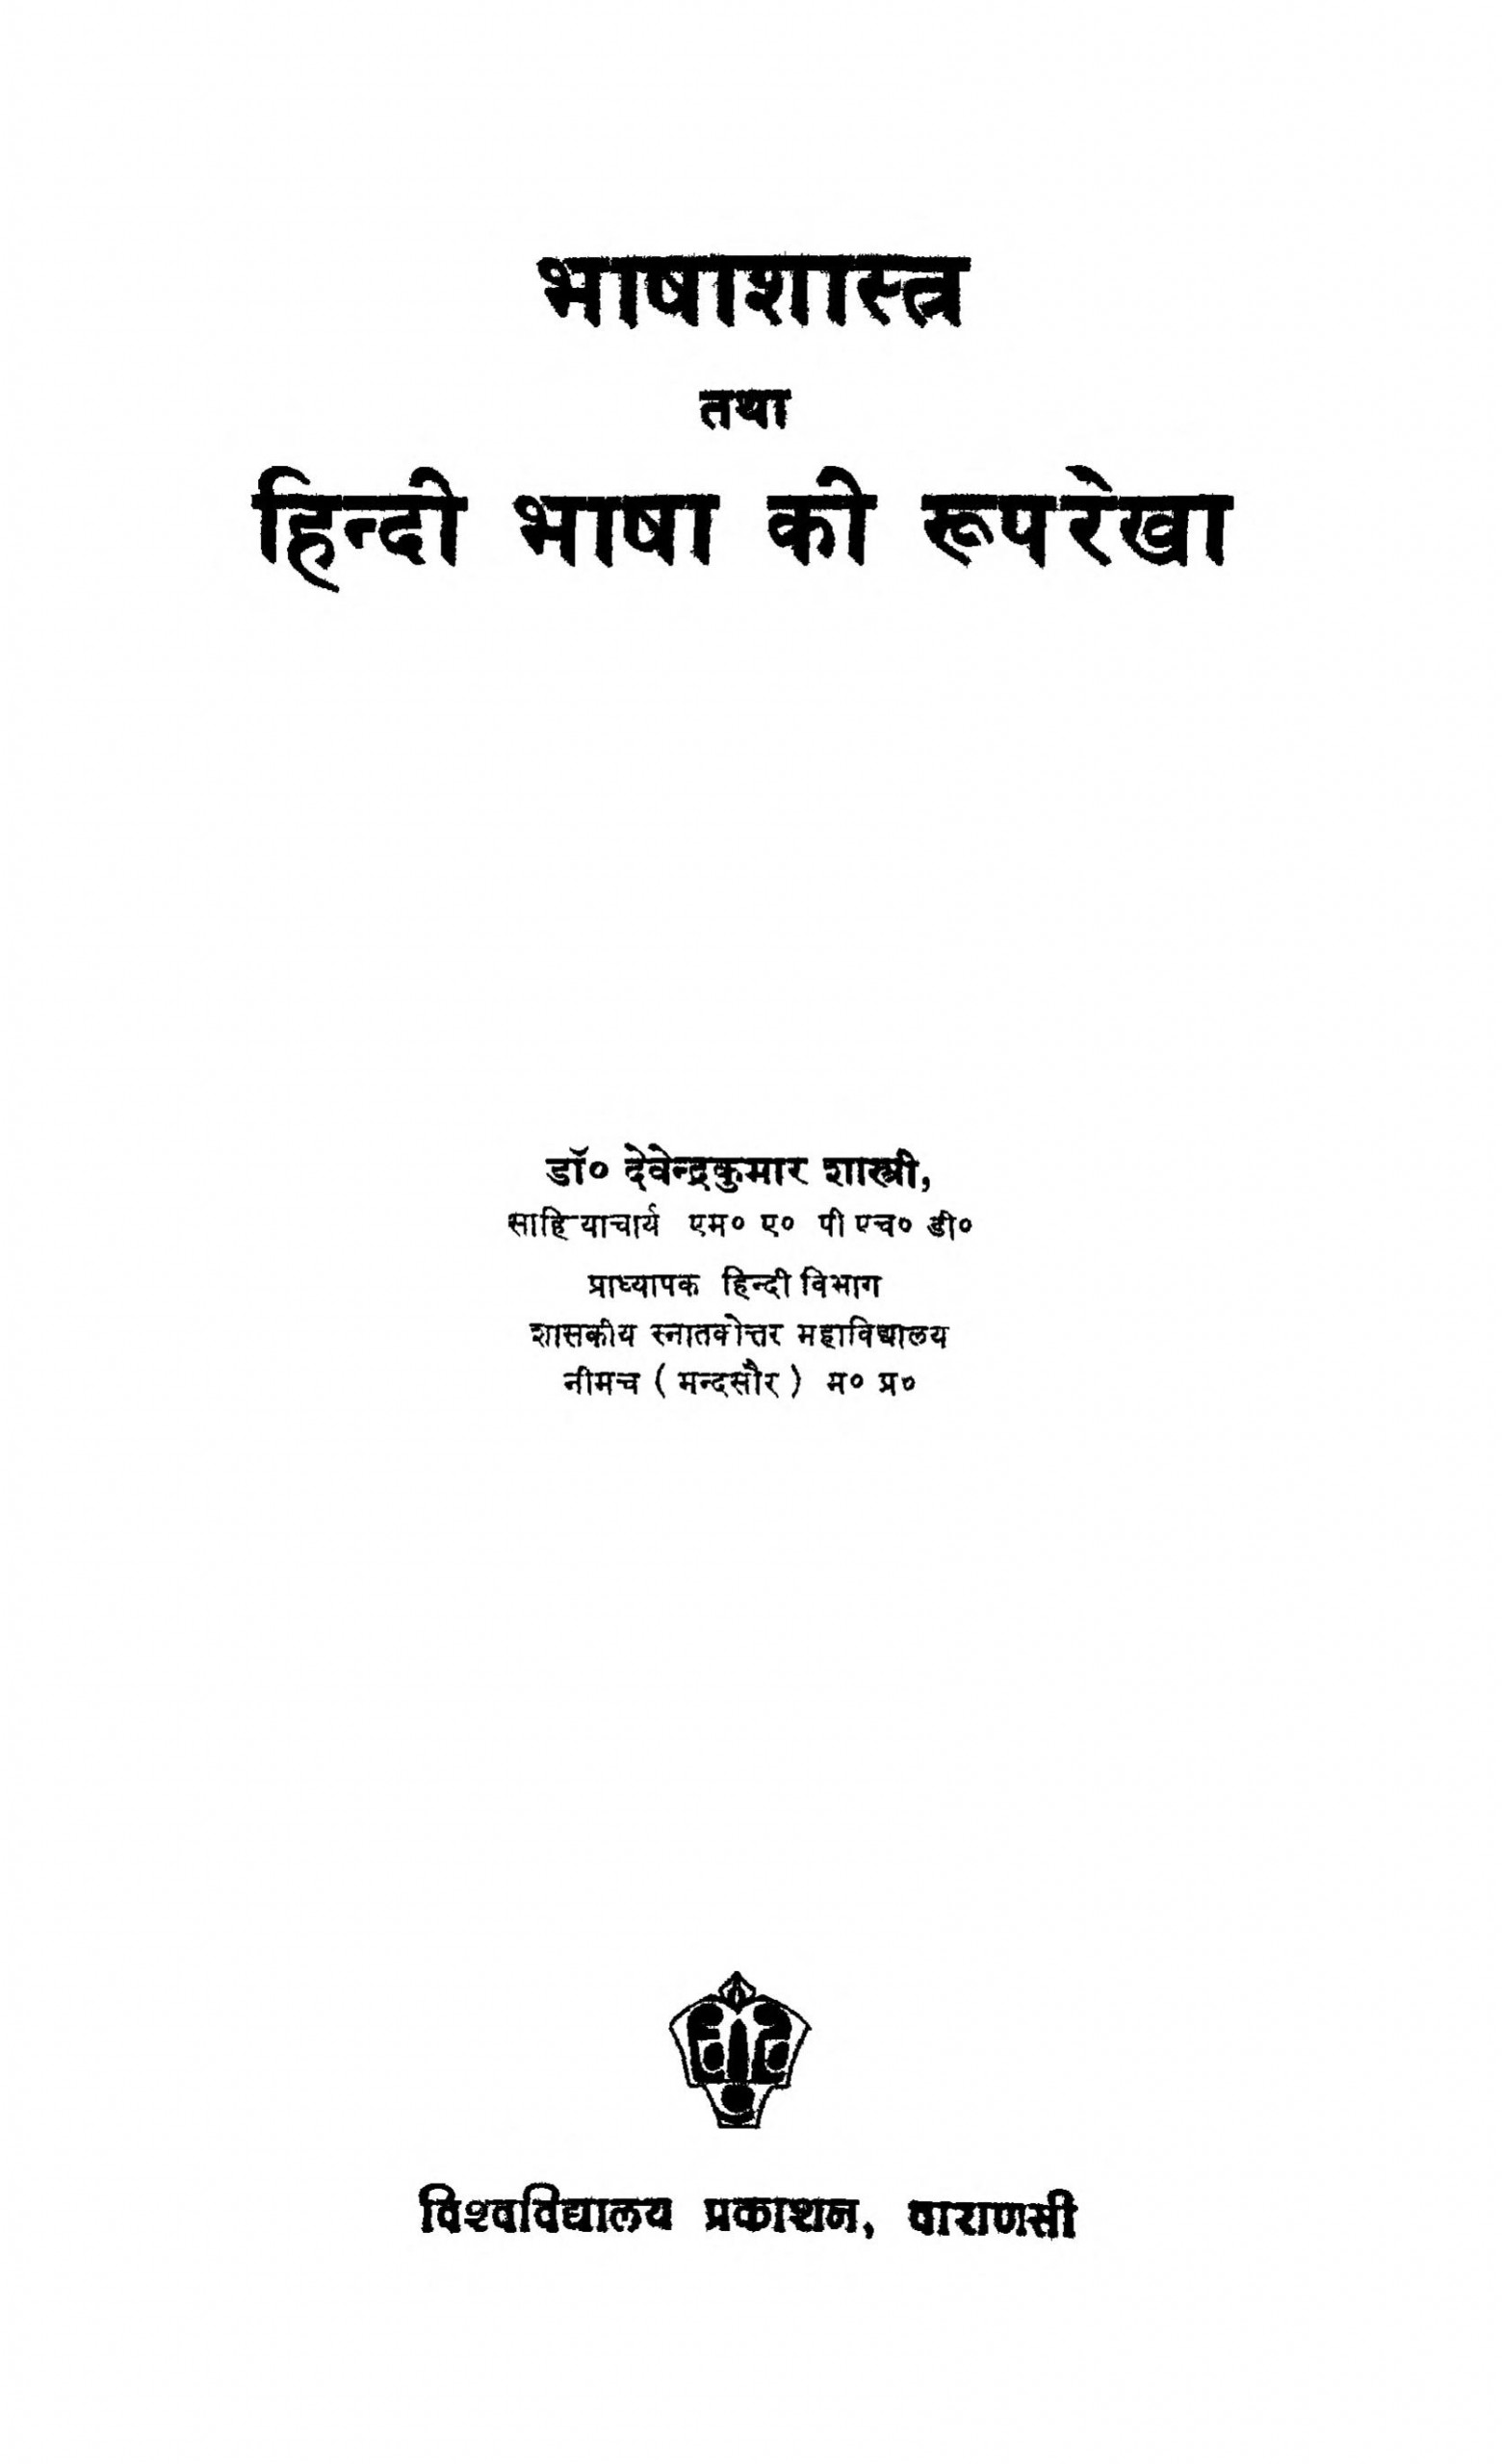 Book Image : भाषाशास्त्र तथा हिन्दी भाषा की रूपरेखा - Bhasha Shastr Tatha Hindi Bhasha Ki Ruparekha